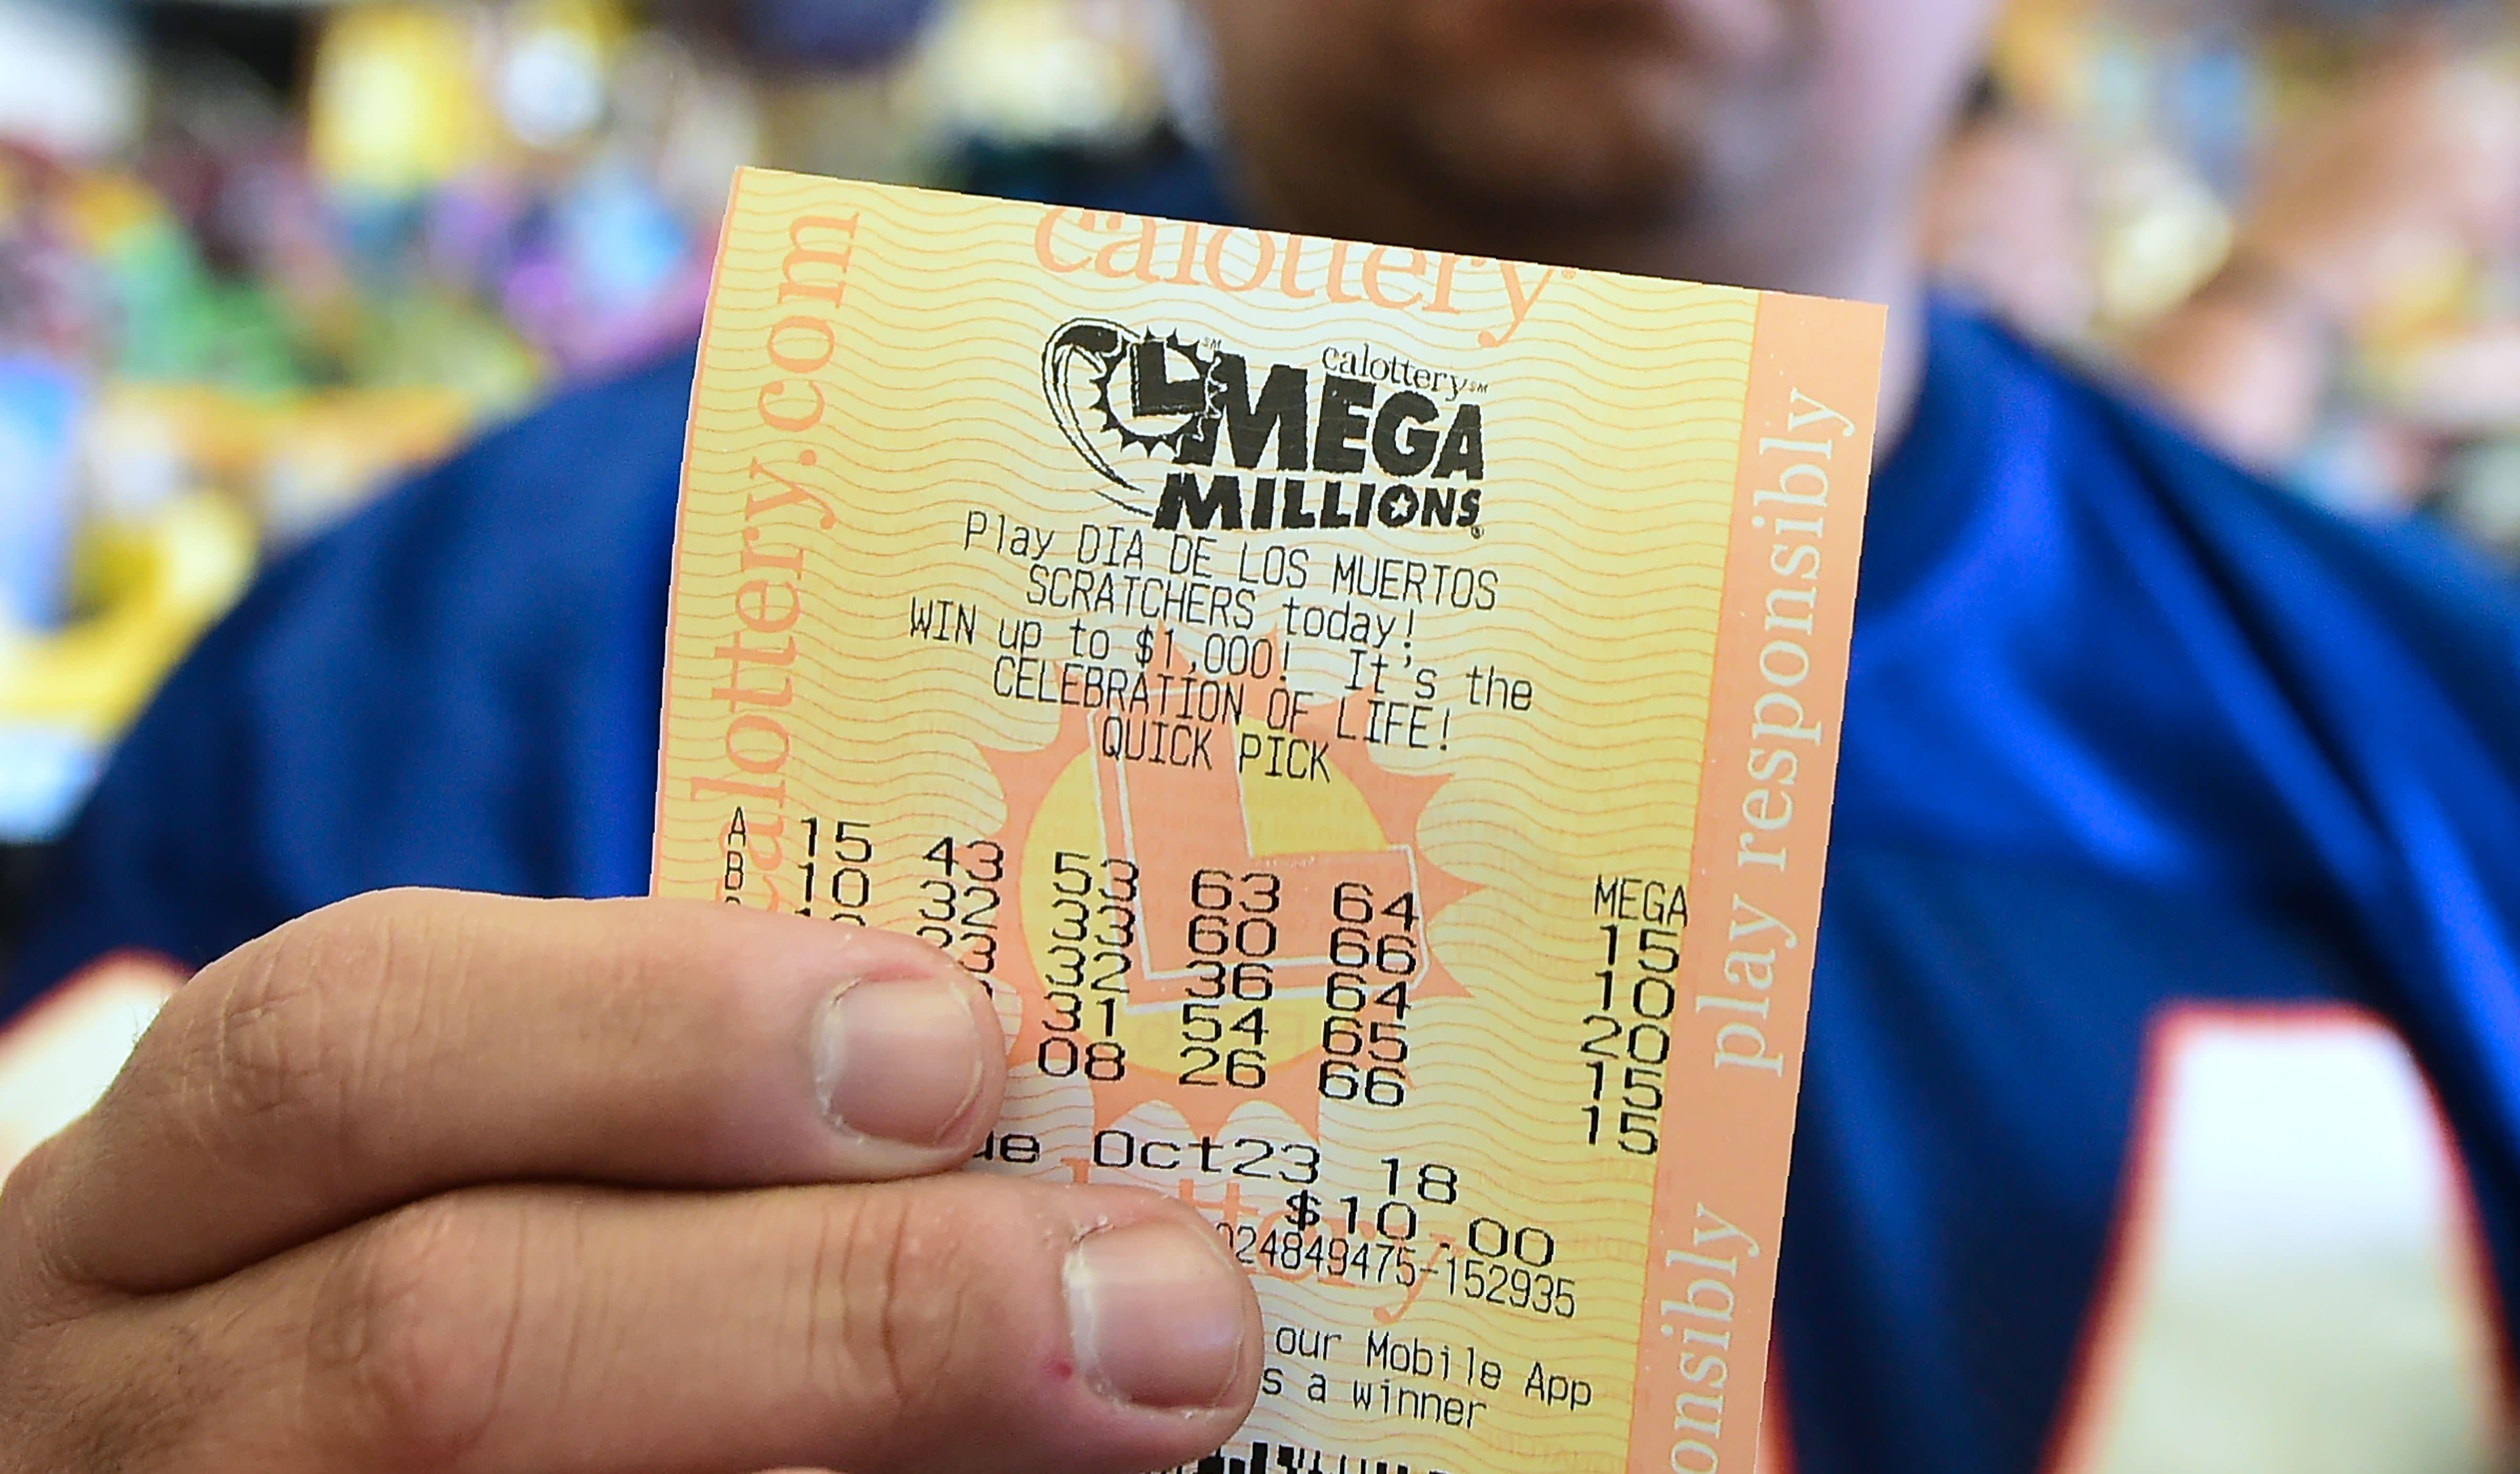 The $1 5 Billion Mega Millions Jackpot Was Finally Claimed